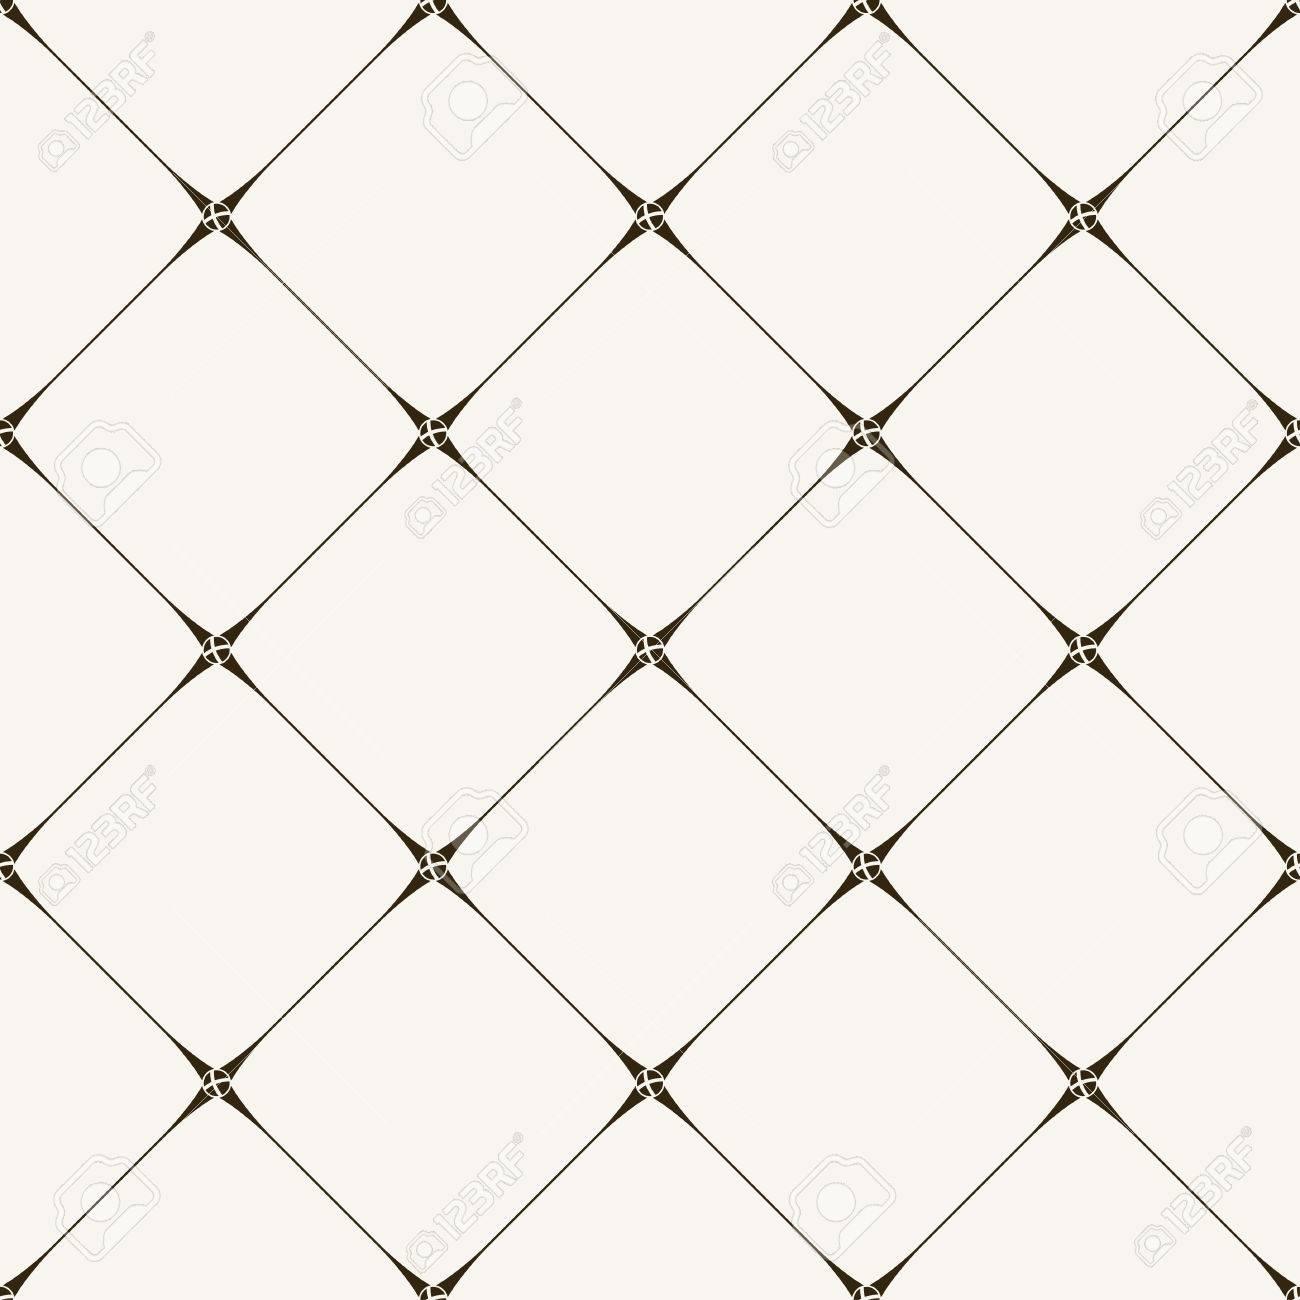 Seamless Tile Pattern. Modern Stylish Texture. Geometric With ...